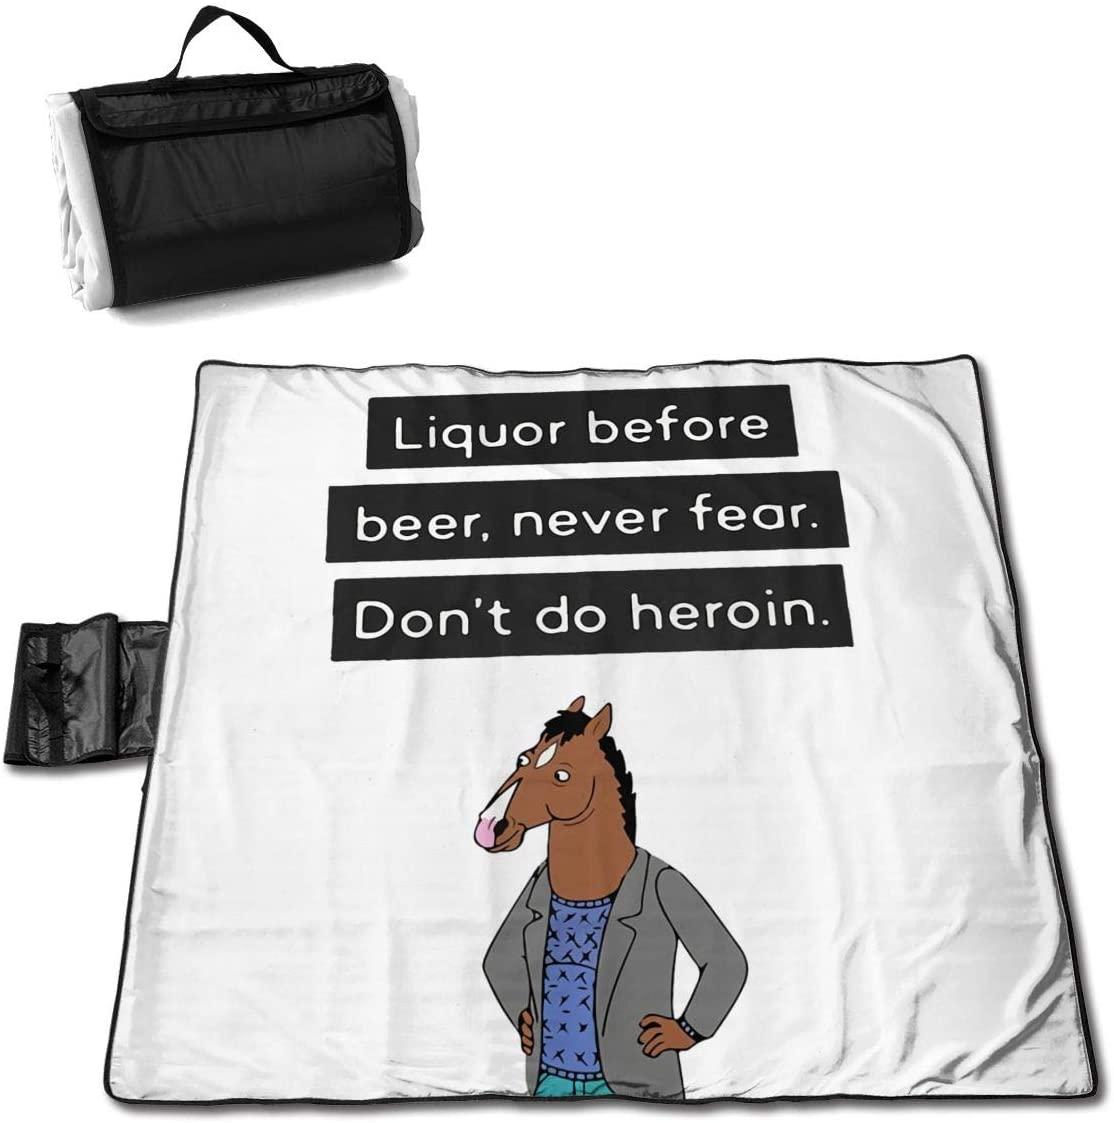 Zcm Bo-Jack Horseman Funny Portable Printed Picnic Blanket Waterproof 59x57(in)